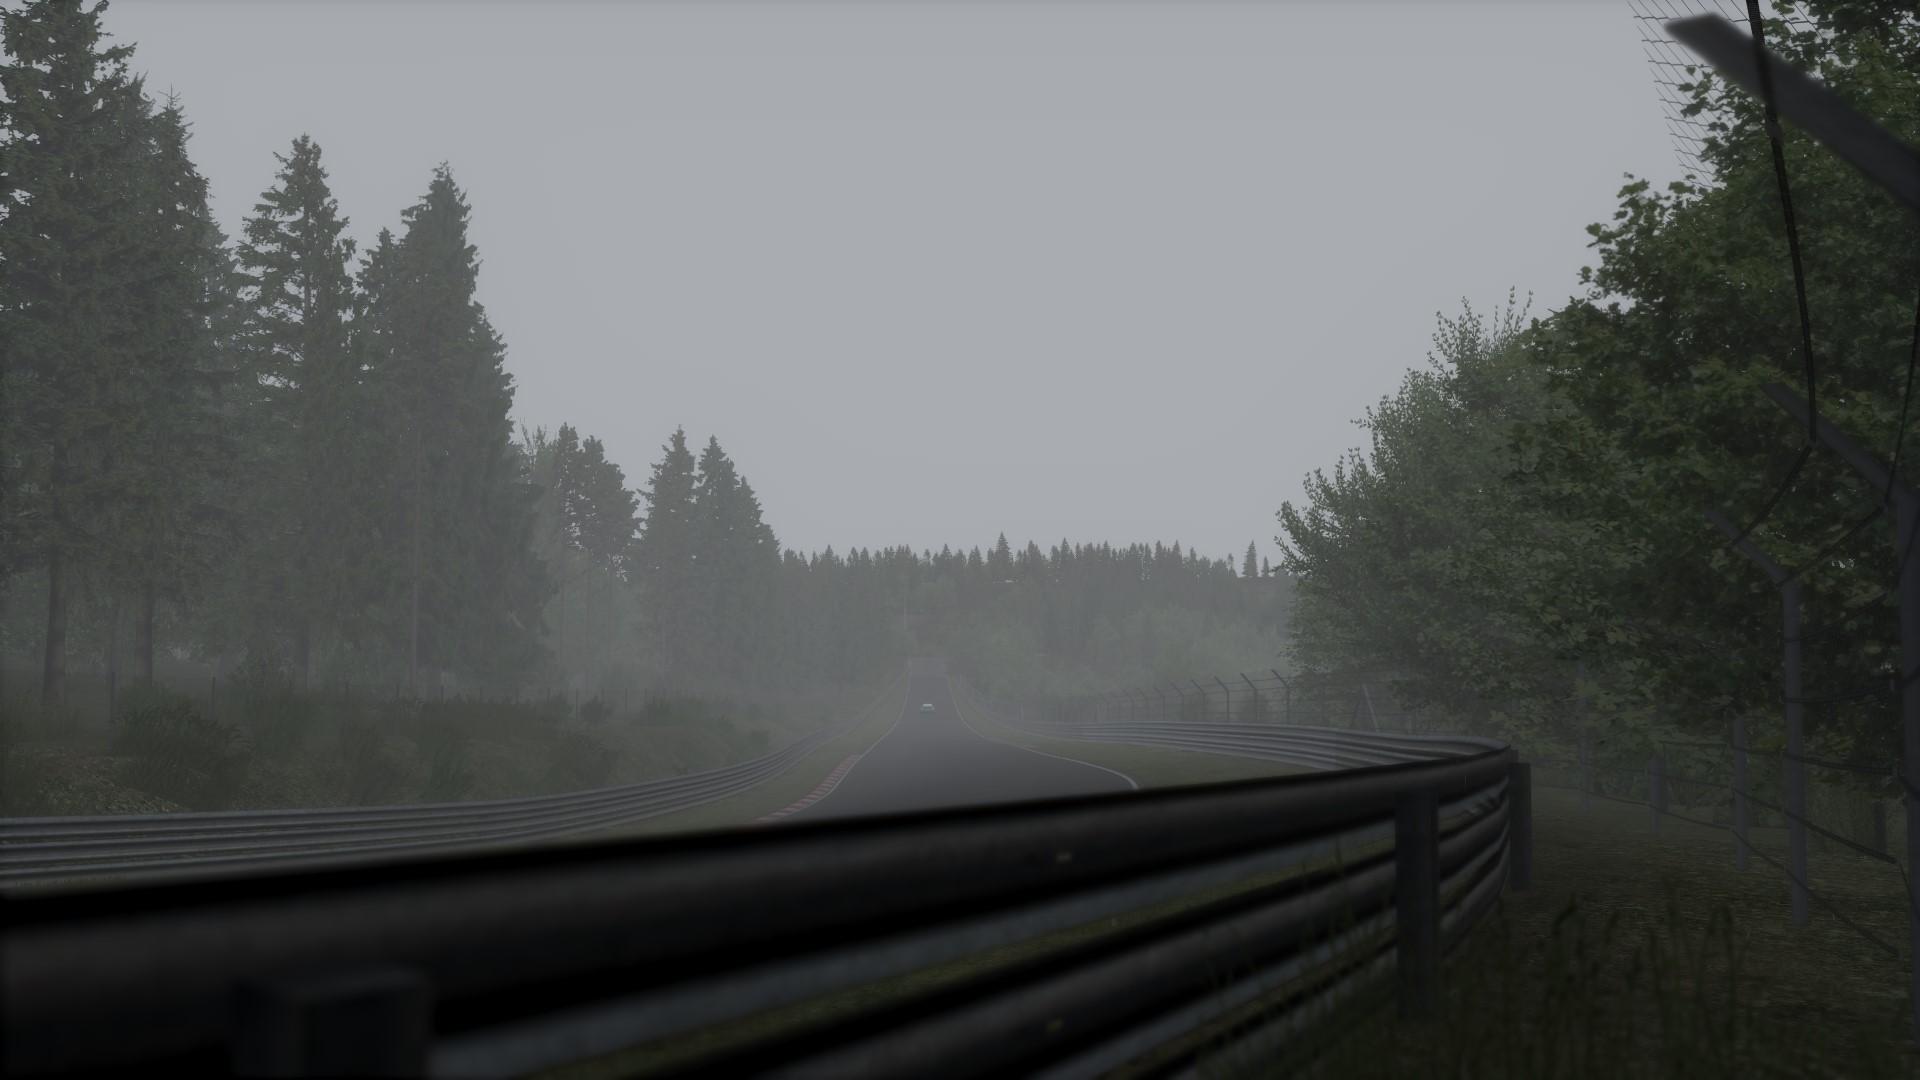 Screenshot_ks_bmw_m235i_racing_ks_nordschleife_15-8-115-15-4-26.jpg